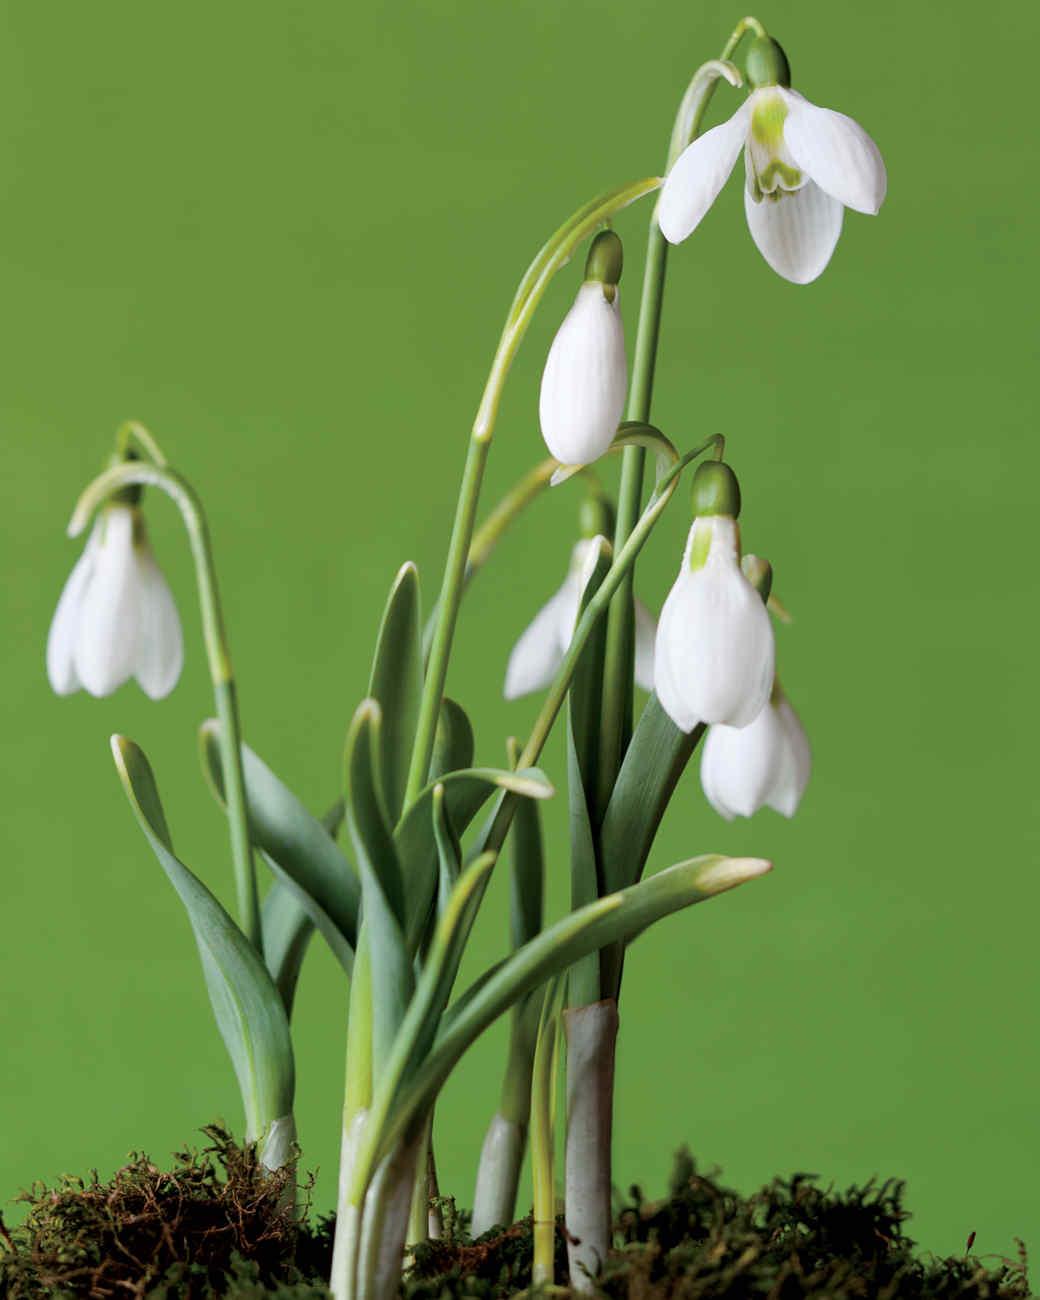 snowdrops-large-flowered-mld107313.jpg